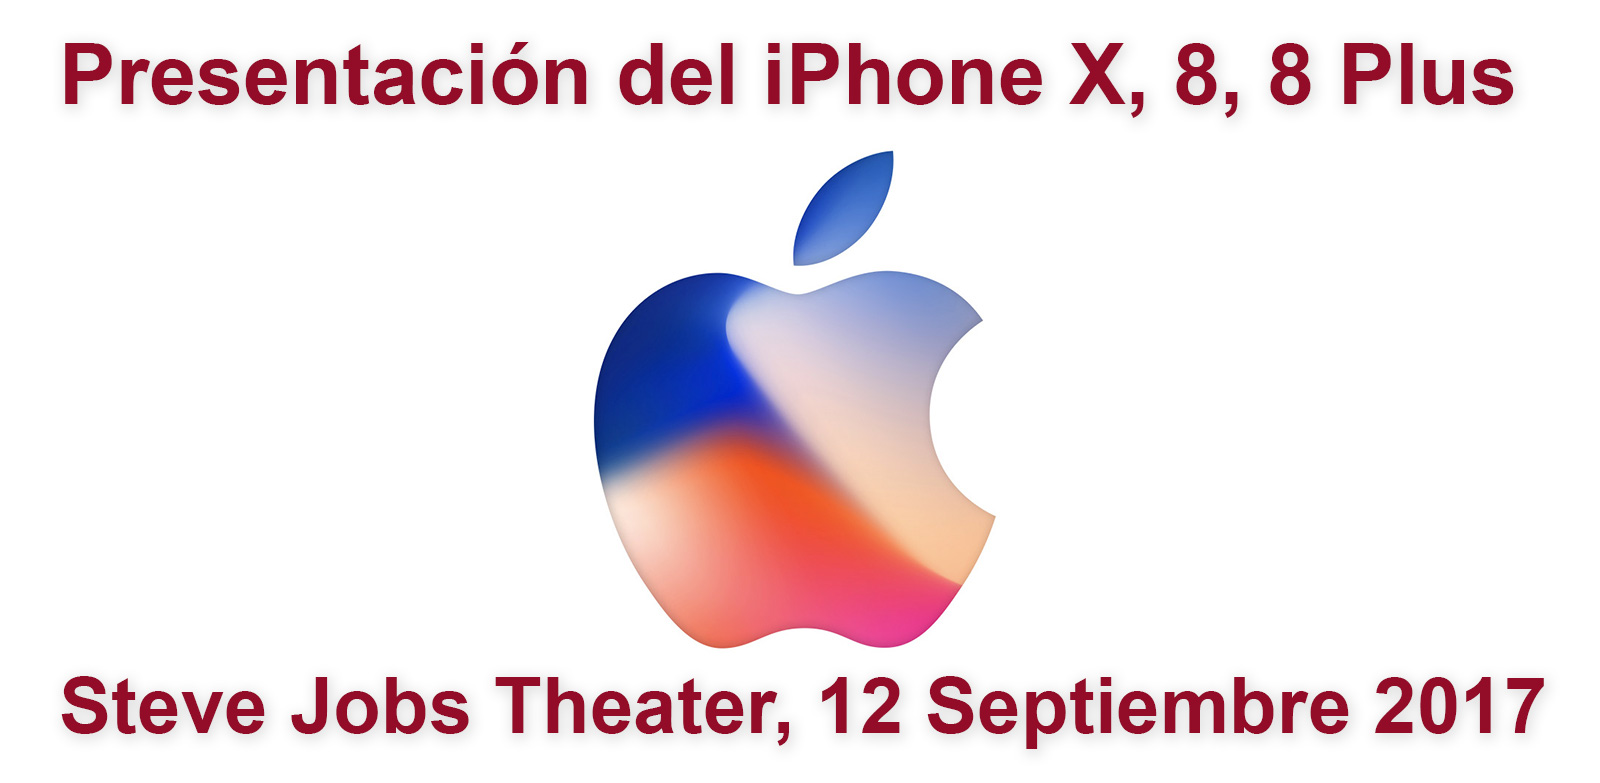 Presentación del iPhone X, iPhone 8, iPhone ocho Plus en el Steve Jobs Theater, doce de Septiembre de 2017